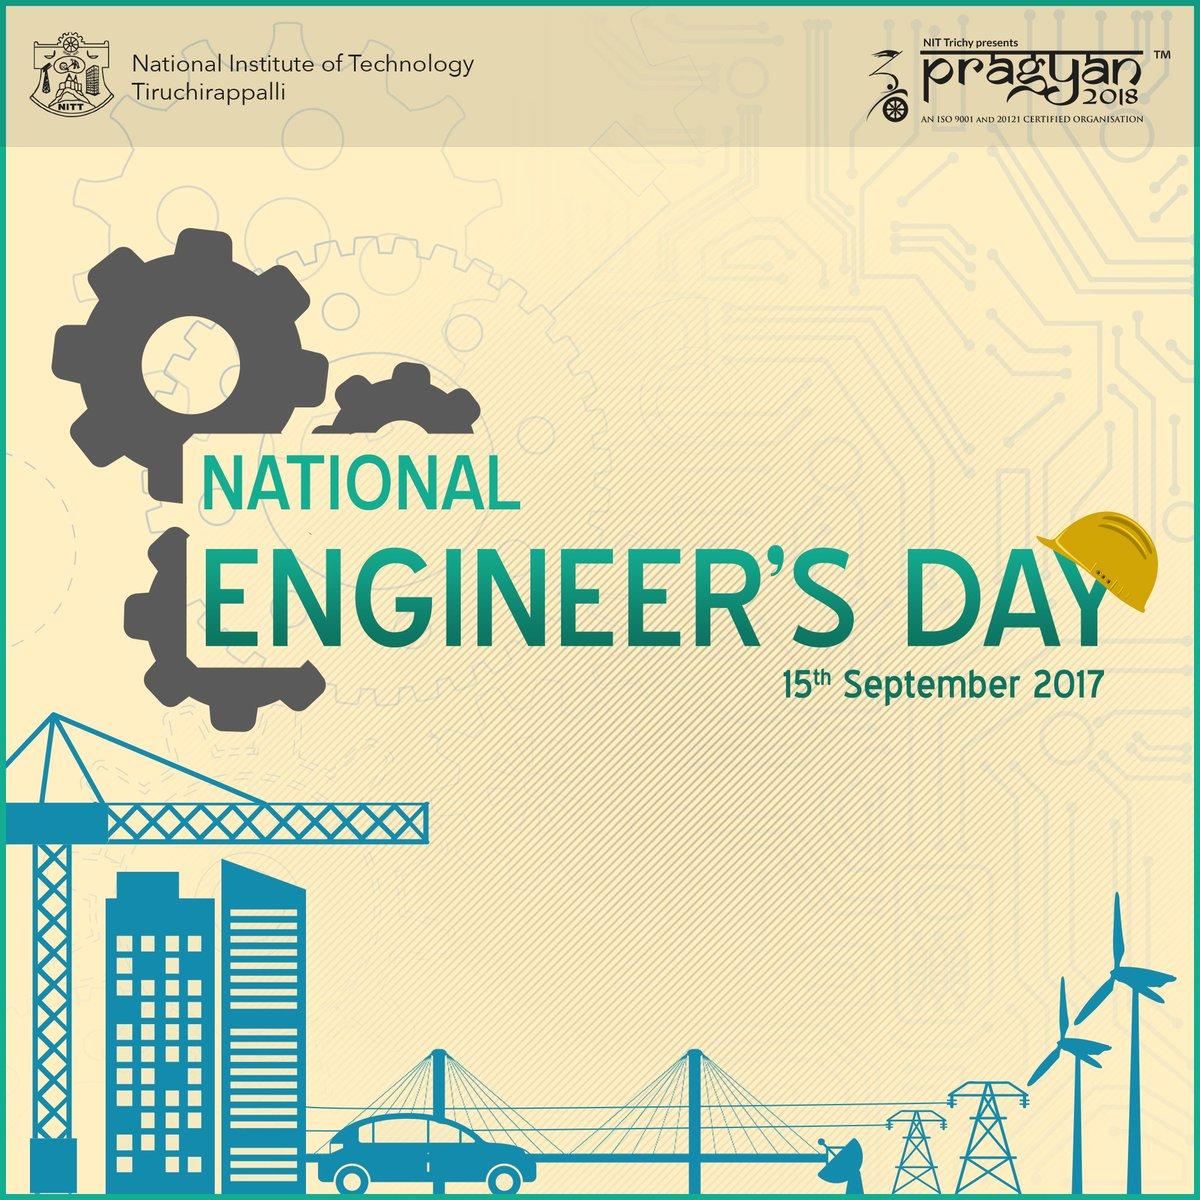 #Pragyan celebrates #EngineersDay and salutes Bharat Ratna M. Visvesvaraya, a leader by example. #LetsCelebrateTechnology #Engineers<br>http://pic.twitter.com/KnVvuDm42s